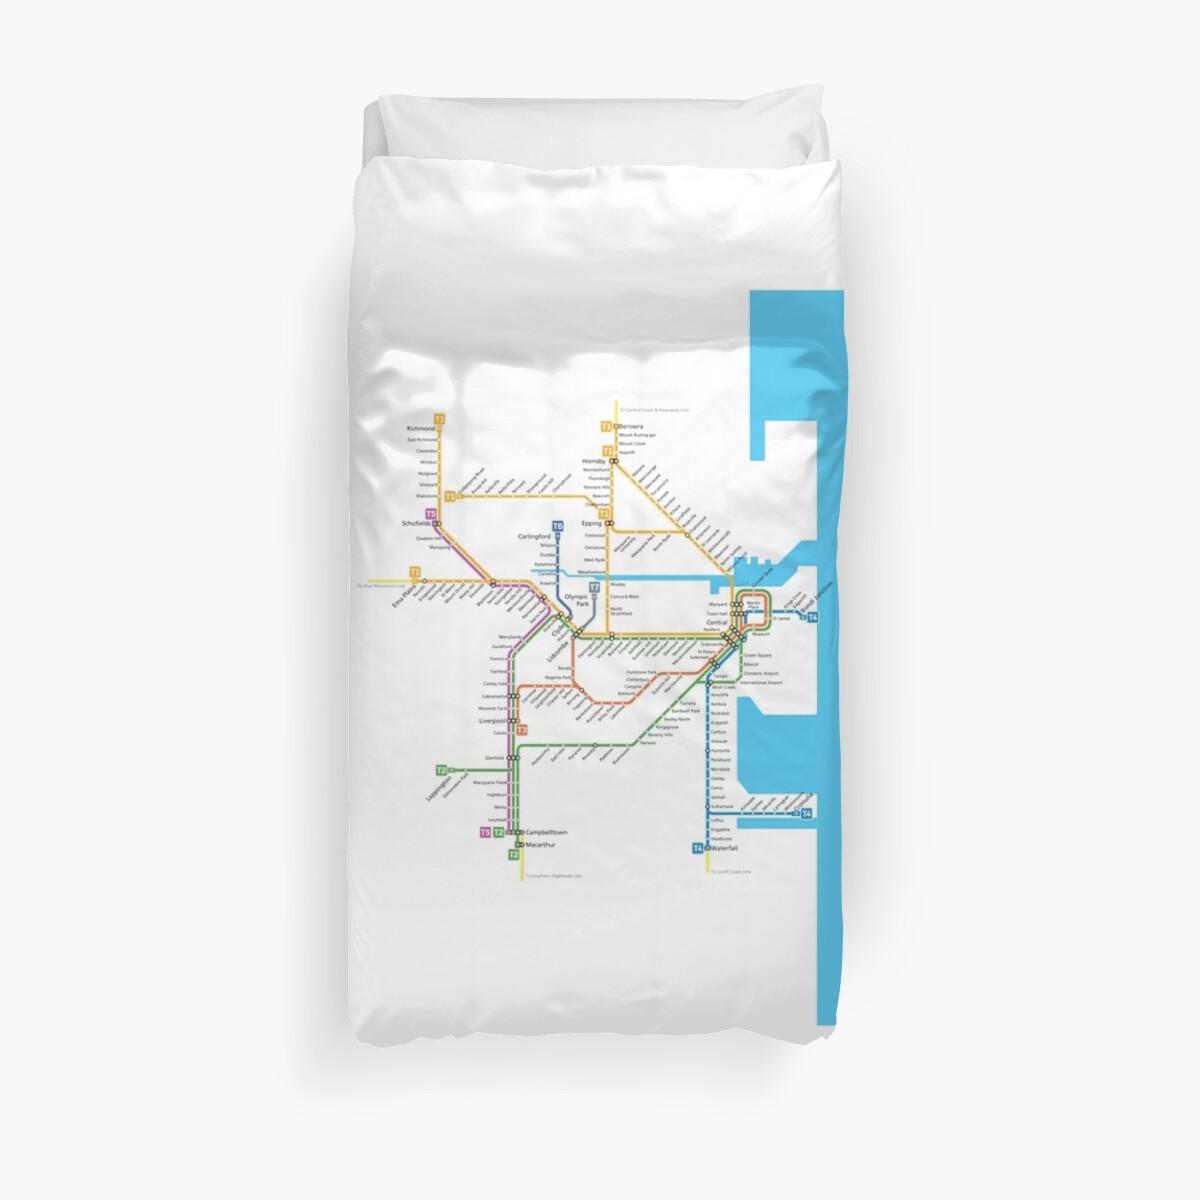 Sydney Trains Map Duvet Cover